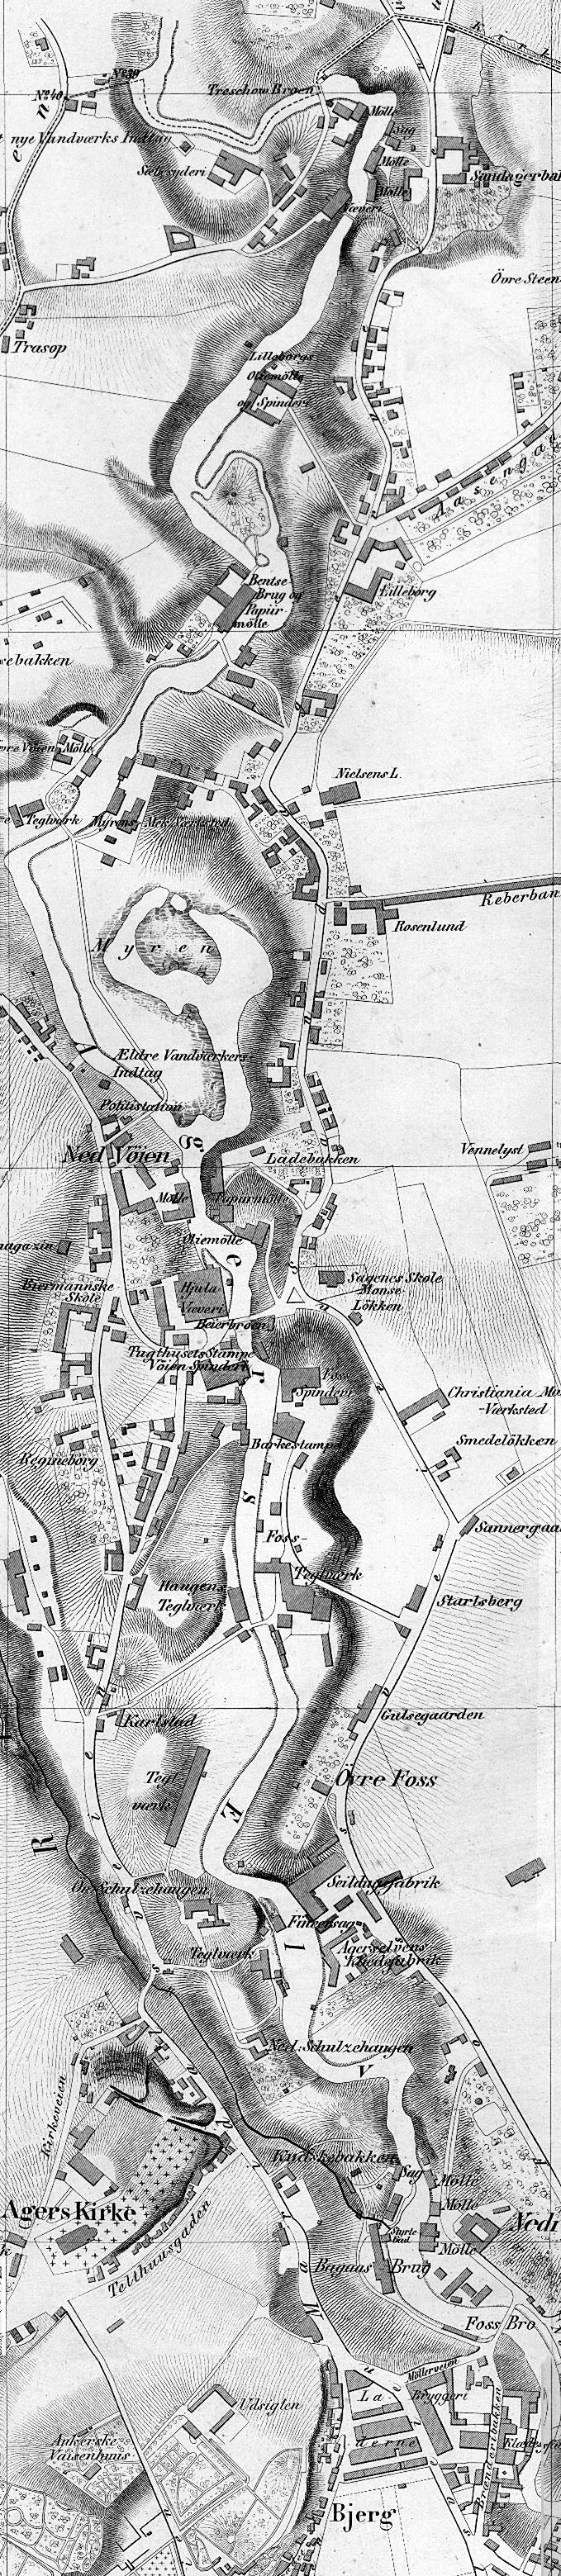 akerselva kart File:Akerselva kart 1860.   Wikimedia Commons akerselva kart